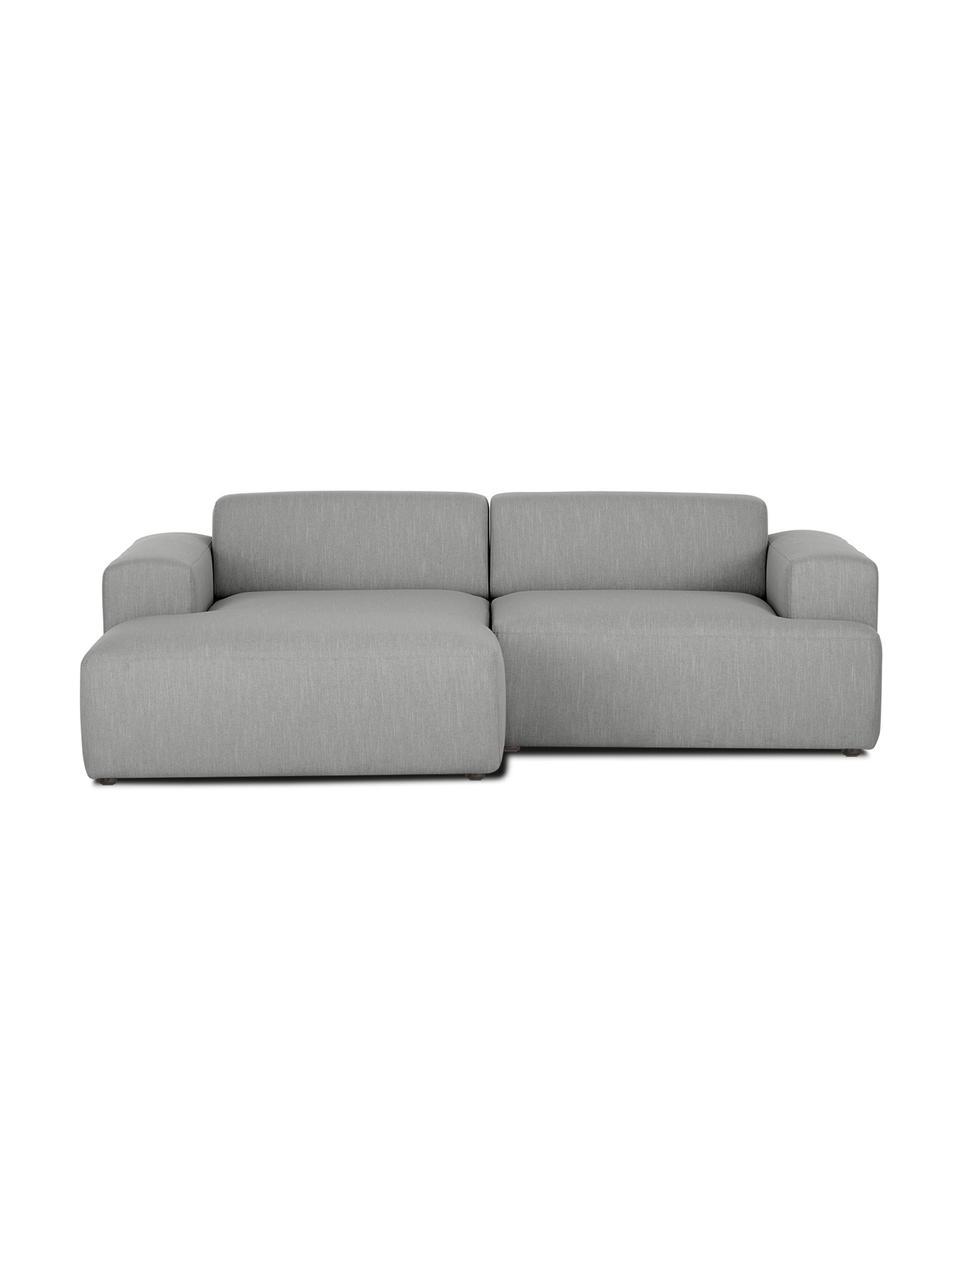 Hoekbank Melva (3-zits) in grijs, Bekleding: 100% polyester, Frame: massief grenenhout, FSC-g, Poten: kunststof, Geweven stof grijs, B 239 x D 143 cm